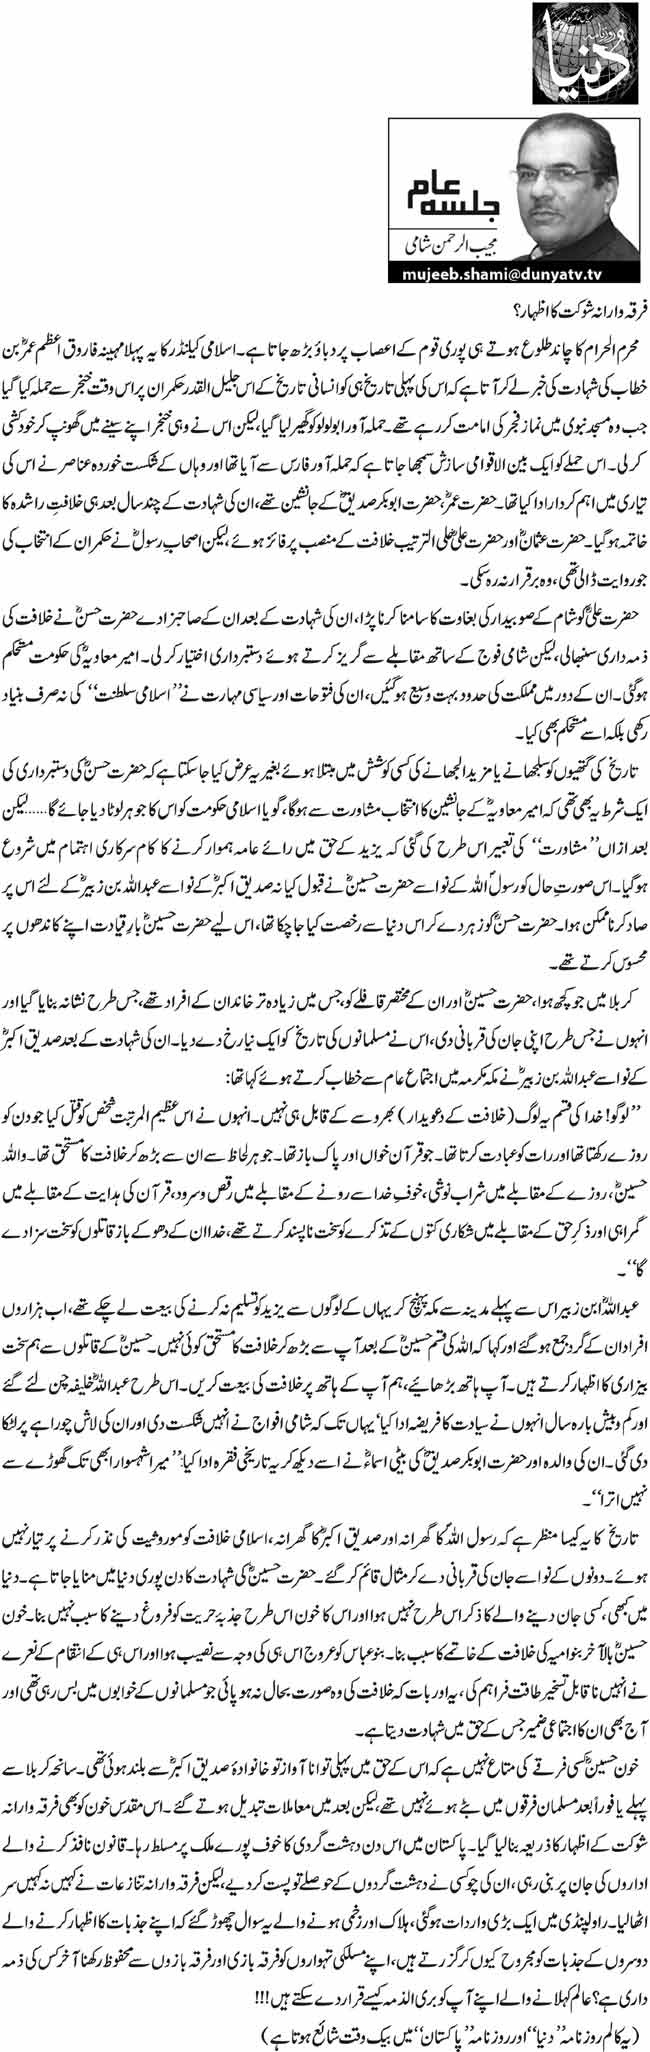 Firqa Warana Shaukat Ka Izhar ? - Mujeeb ur Rehman Shami - 17th November 2013